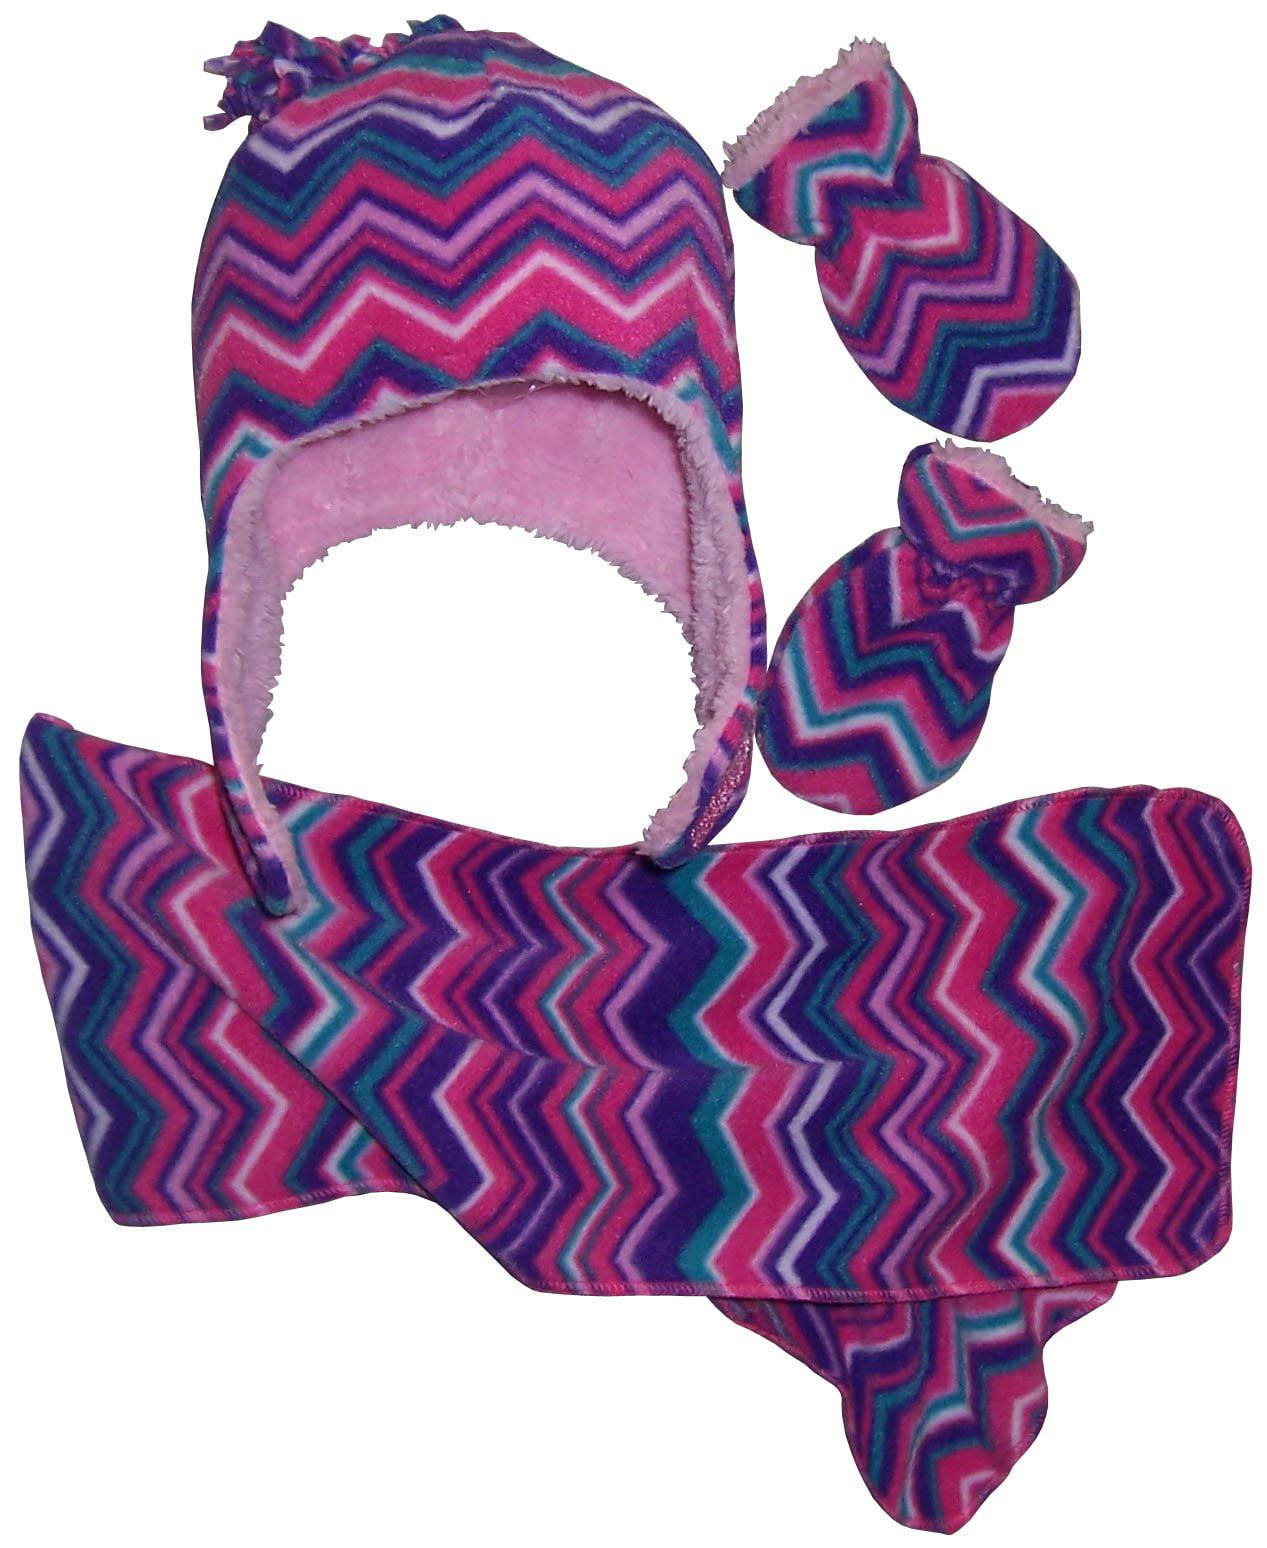 NICE CAPS Girls Chevron Soft Sherpa Lined Hat/Scarf/Mitten Set